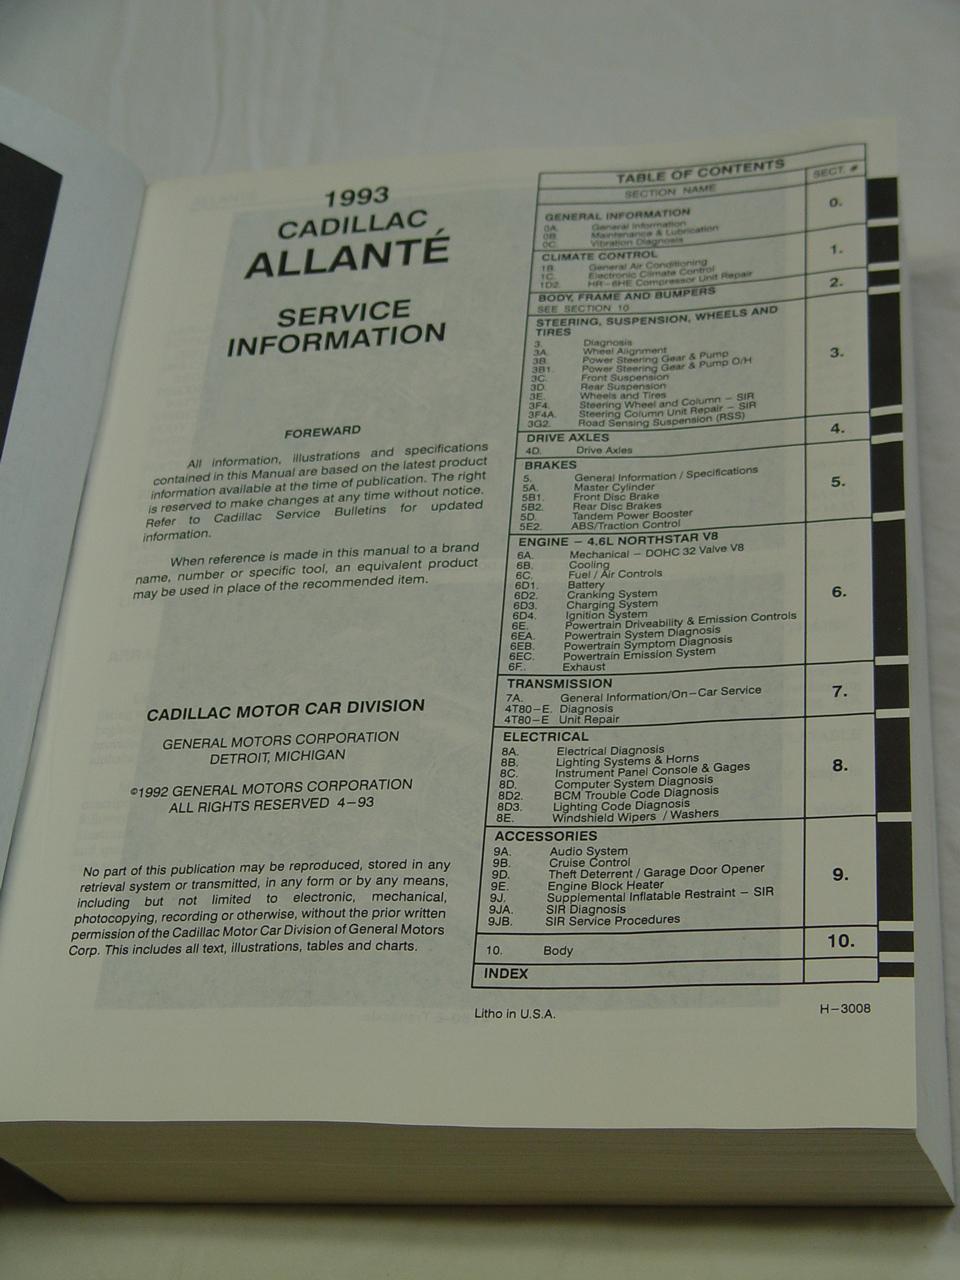 allante 87 89 rh cadillacville com Cadillac Allante Coupe Cadillac Allante Coupe